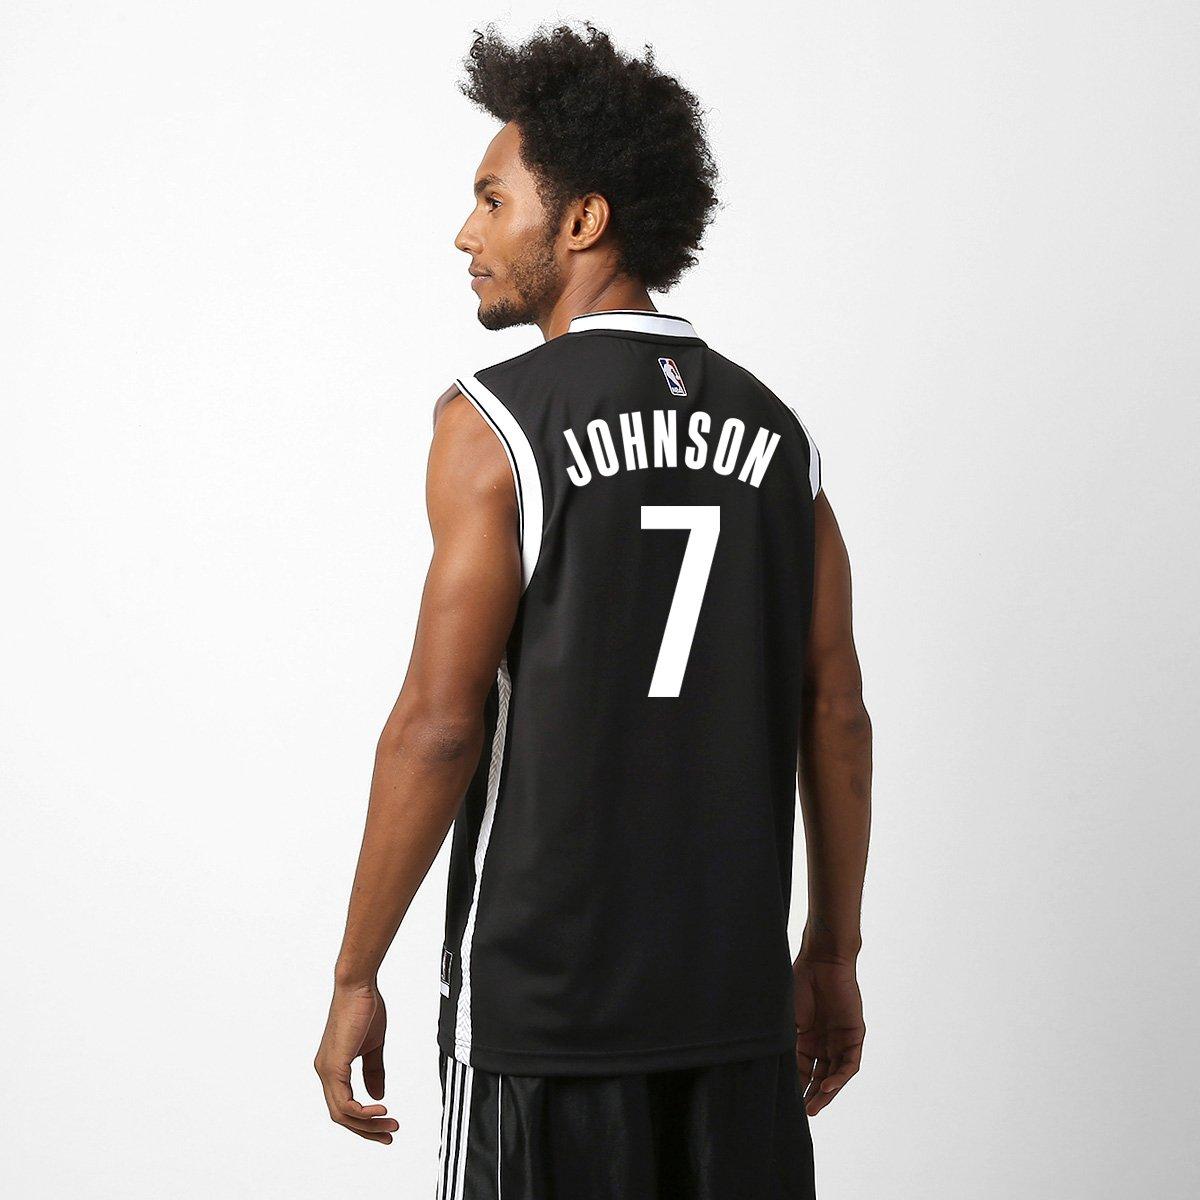 be487dcb2 Camiseta Regata Adidas Brooklyn Nets Road - Johnson nº 7 - Compre Agora